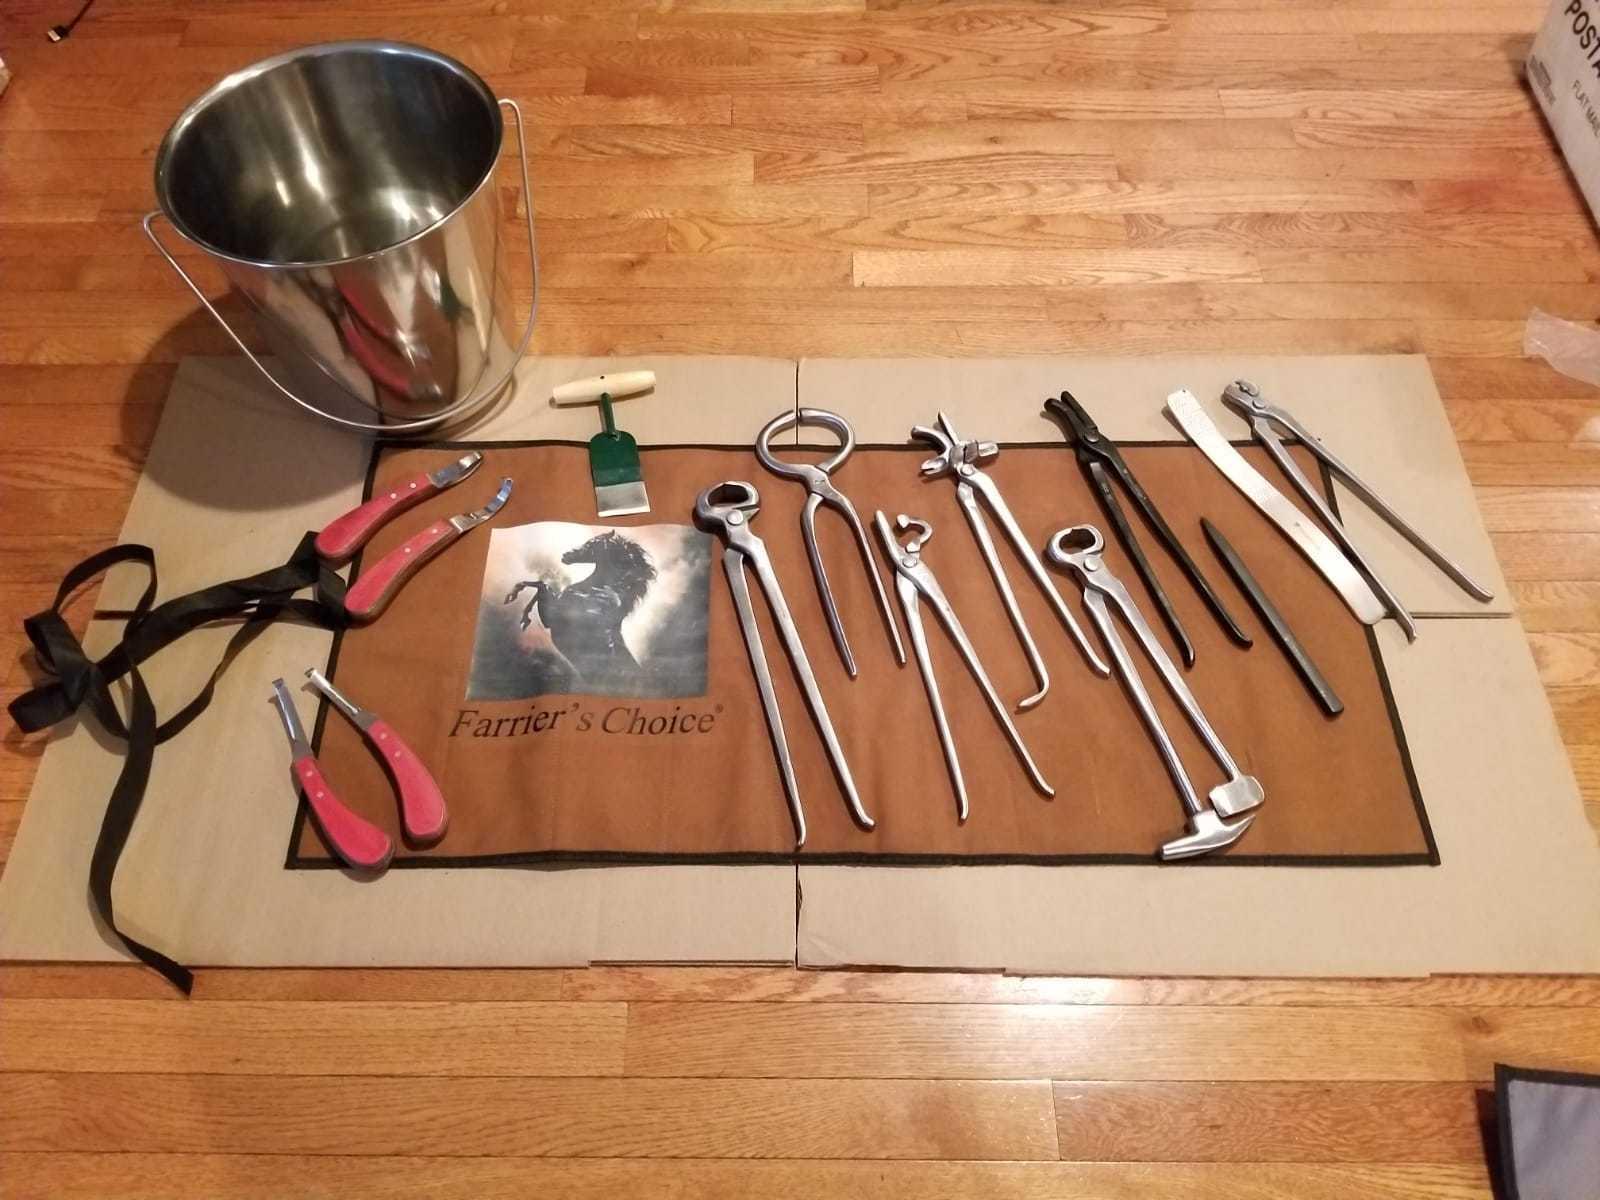 Professional Horse Equine Kit Farrier's Choice Tools Nipper Clincher Rasps Hoof